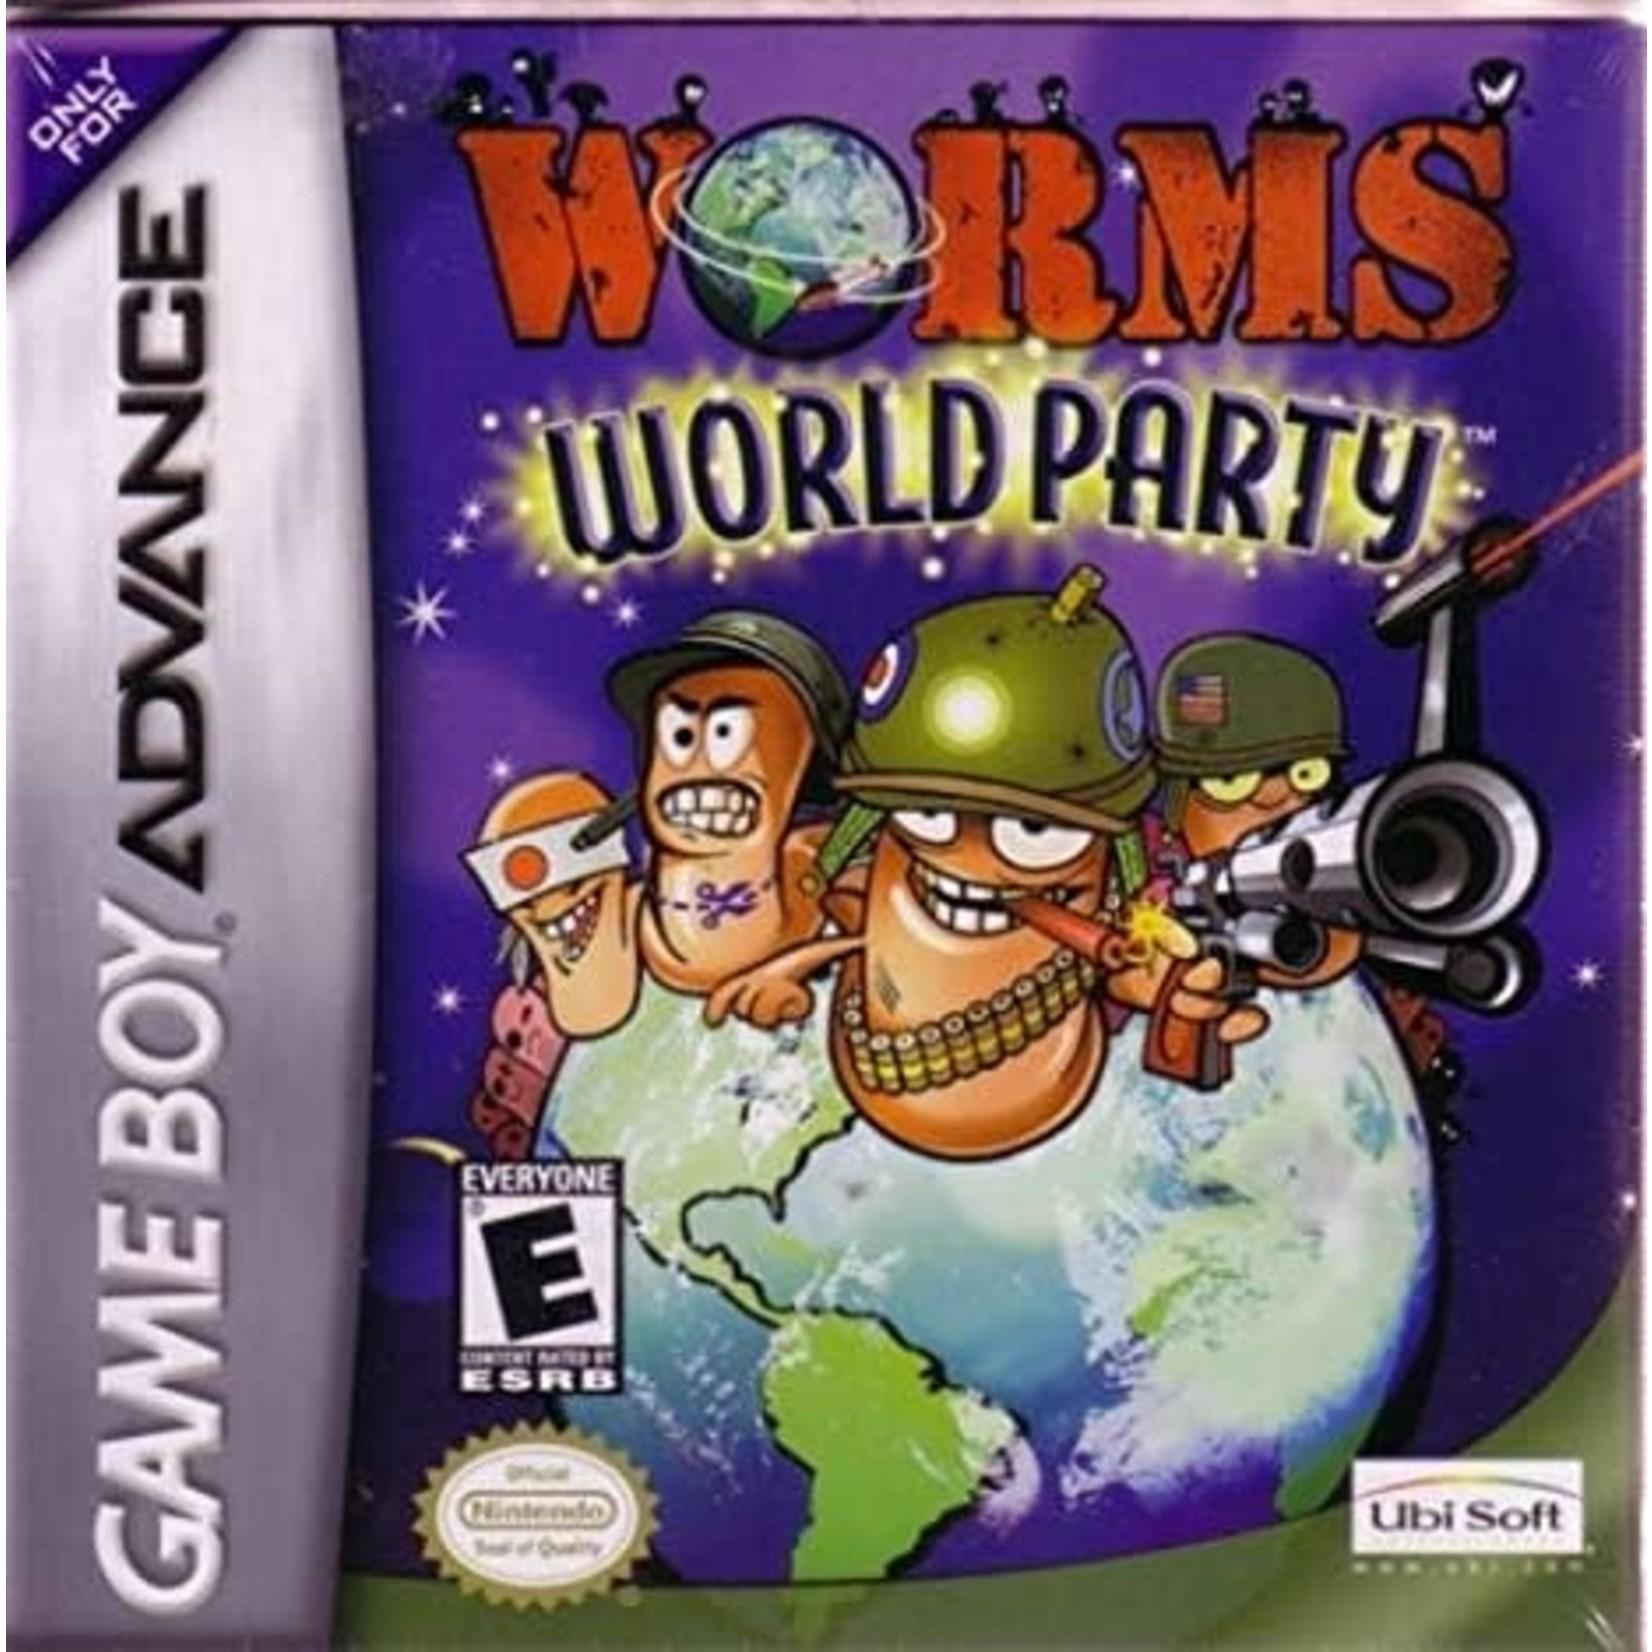 GBAU-Worms World Party